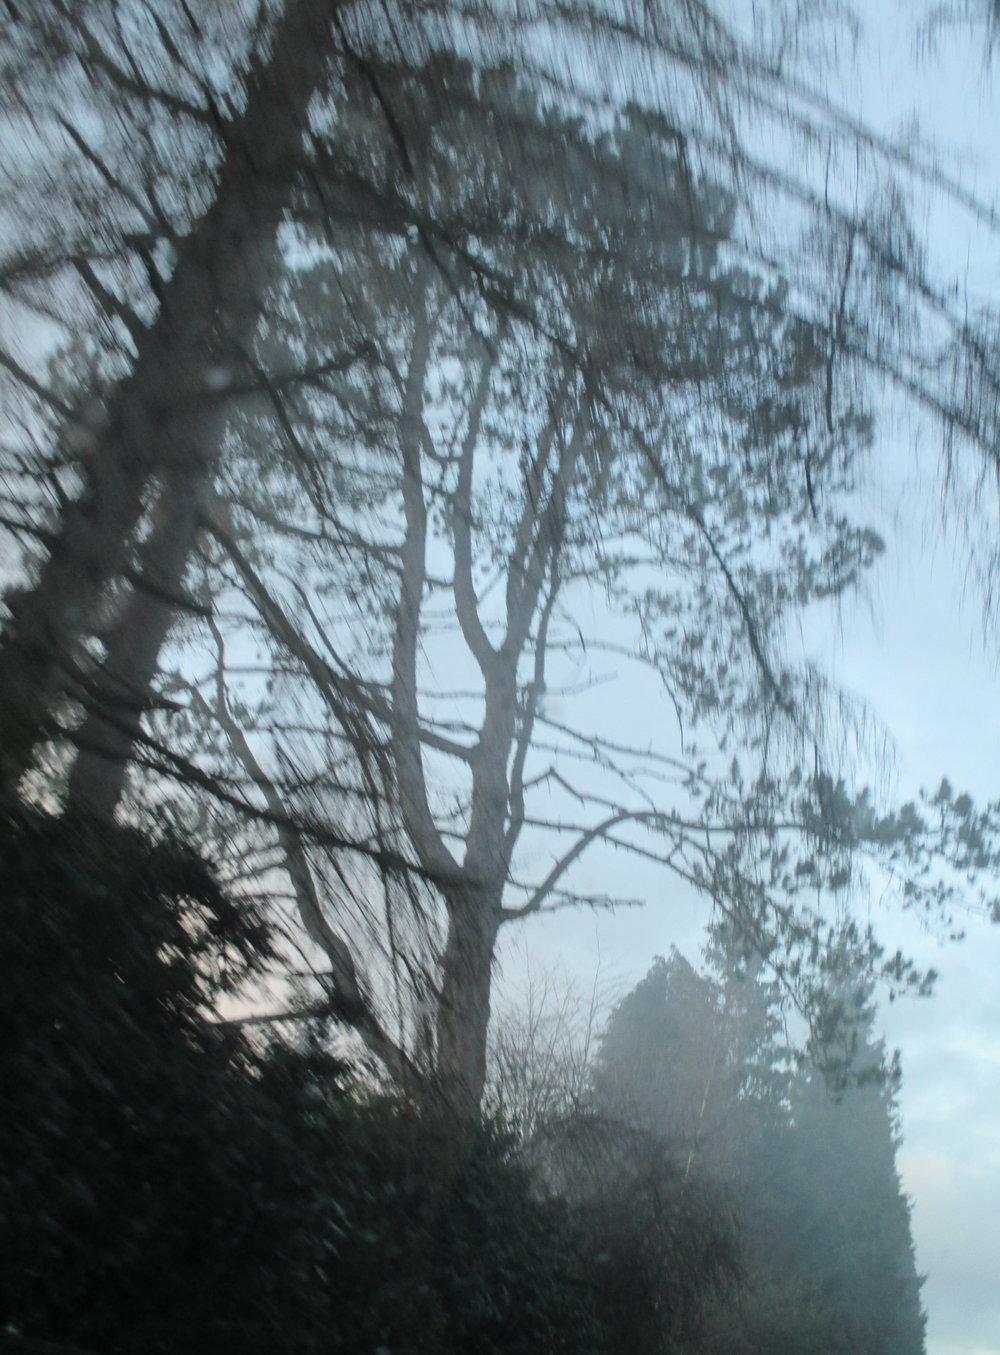 trees 3 photo.JPG